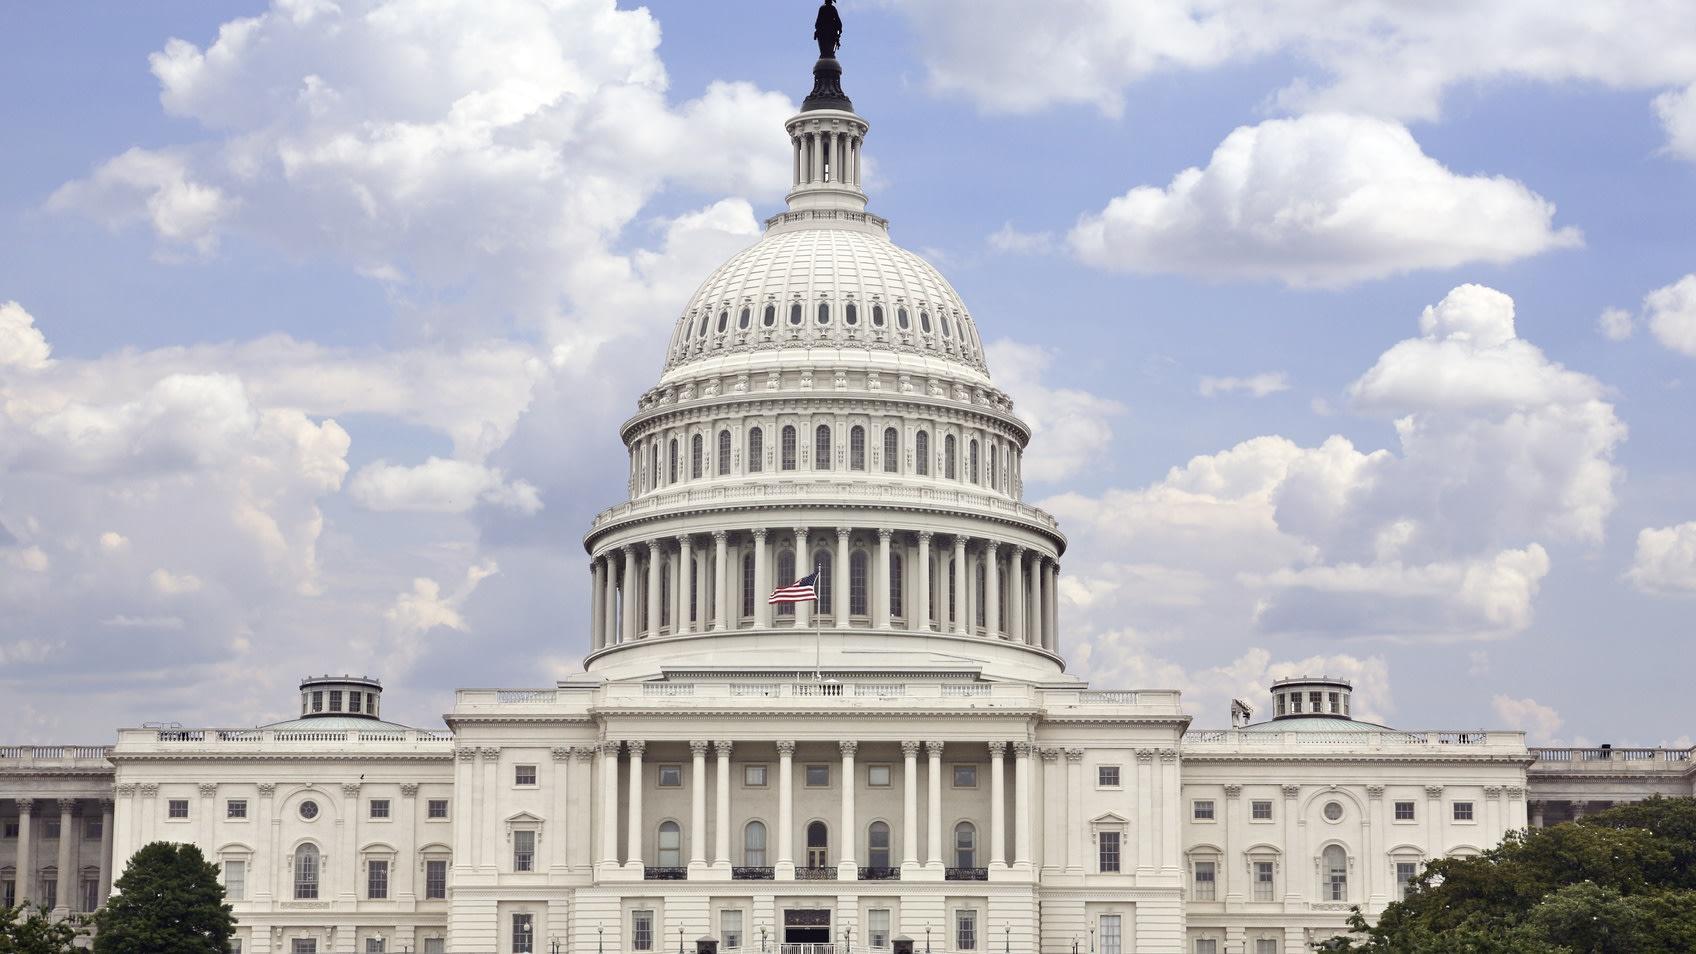 Lawmakers Prepare To Vote On Police Reform Bill Named In Honor Of George Floyd